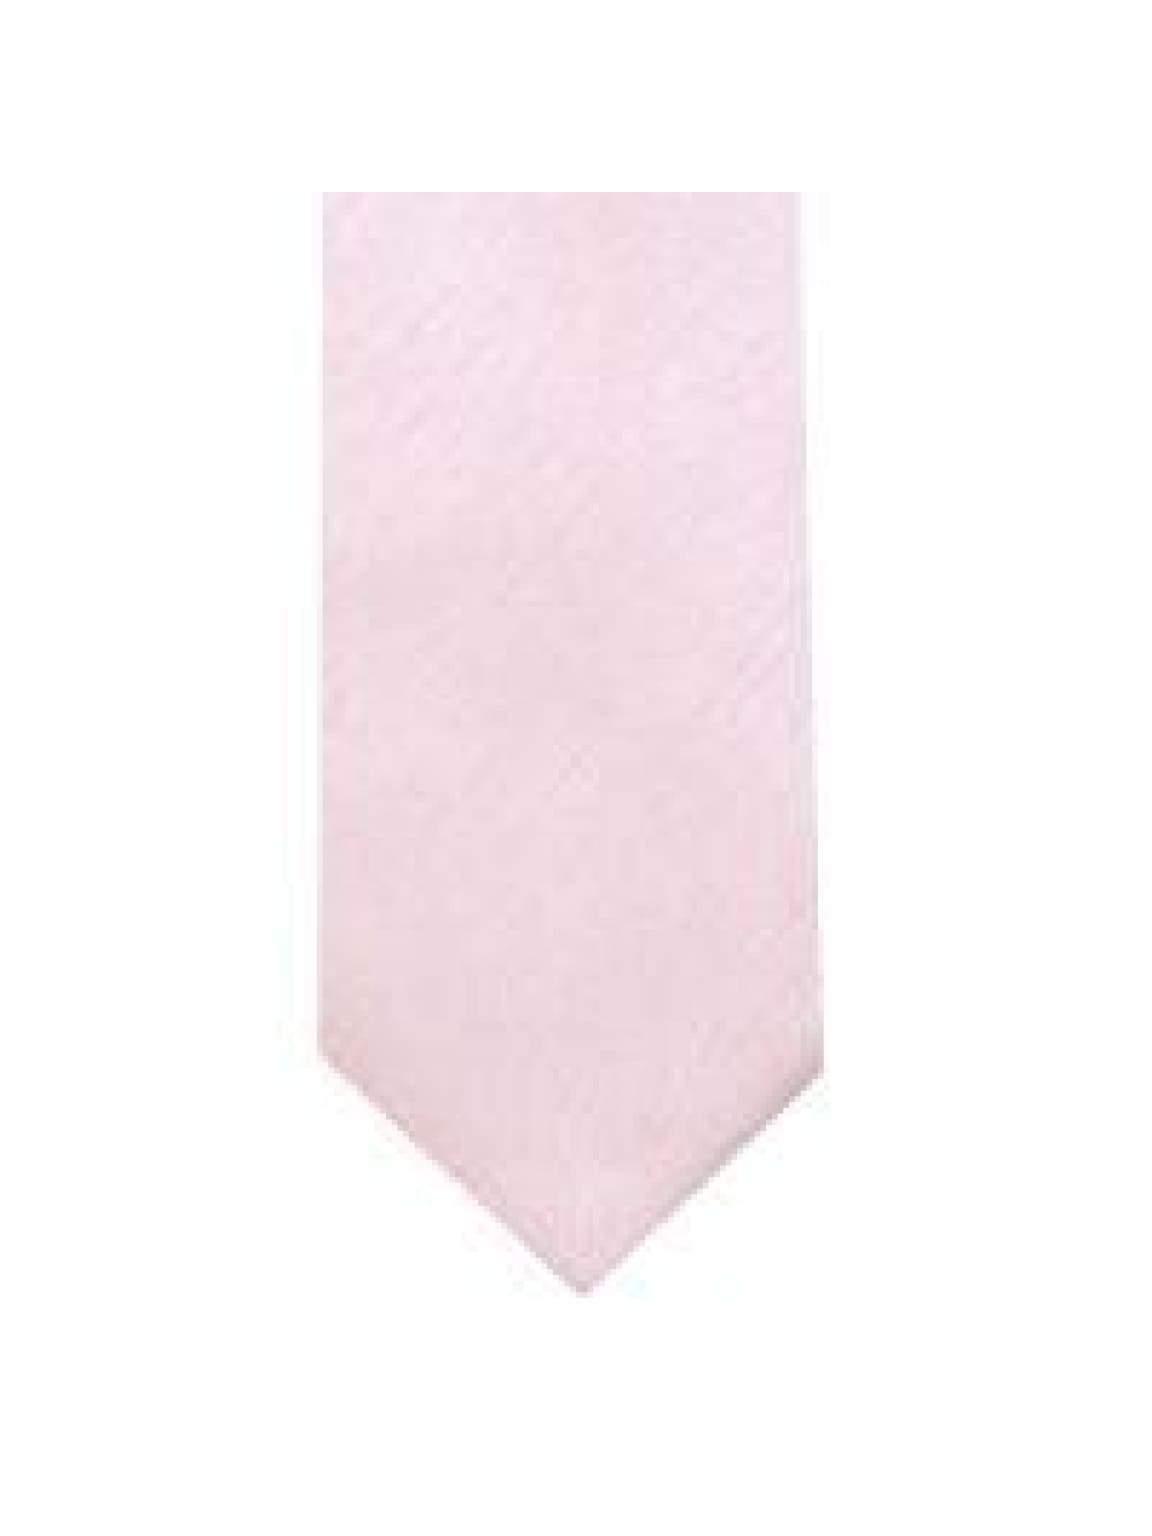 LA Smith Pink Skinny Shantung Tie - Accessories